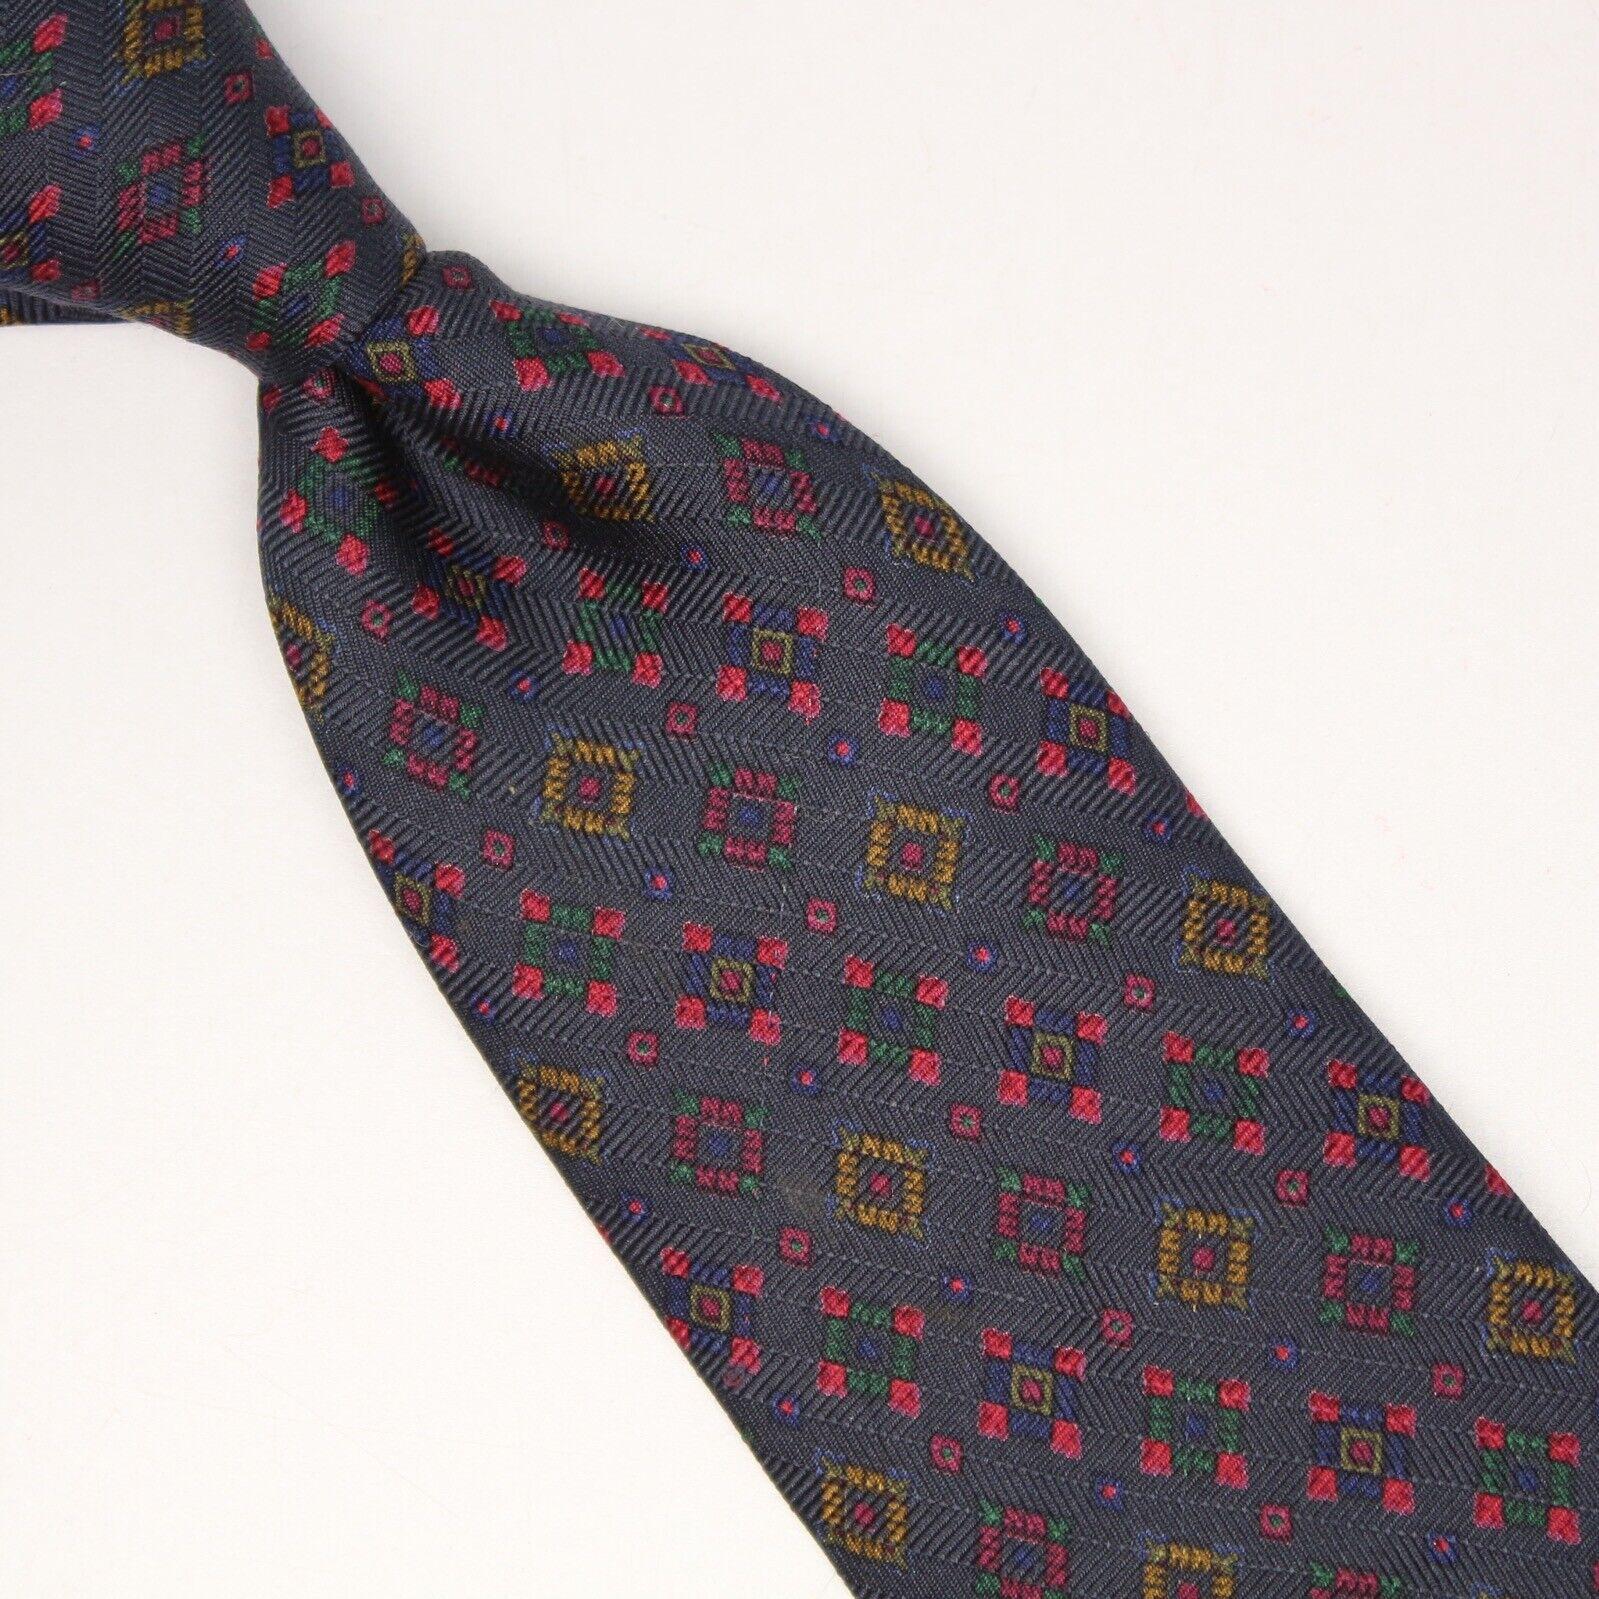 ETRO Herren Seide Krawatte Dunkelblau Rot Gelb Grün Geometrisch Kariert Bedruckt